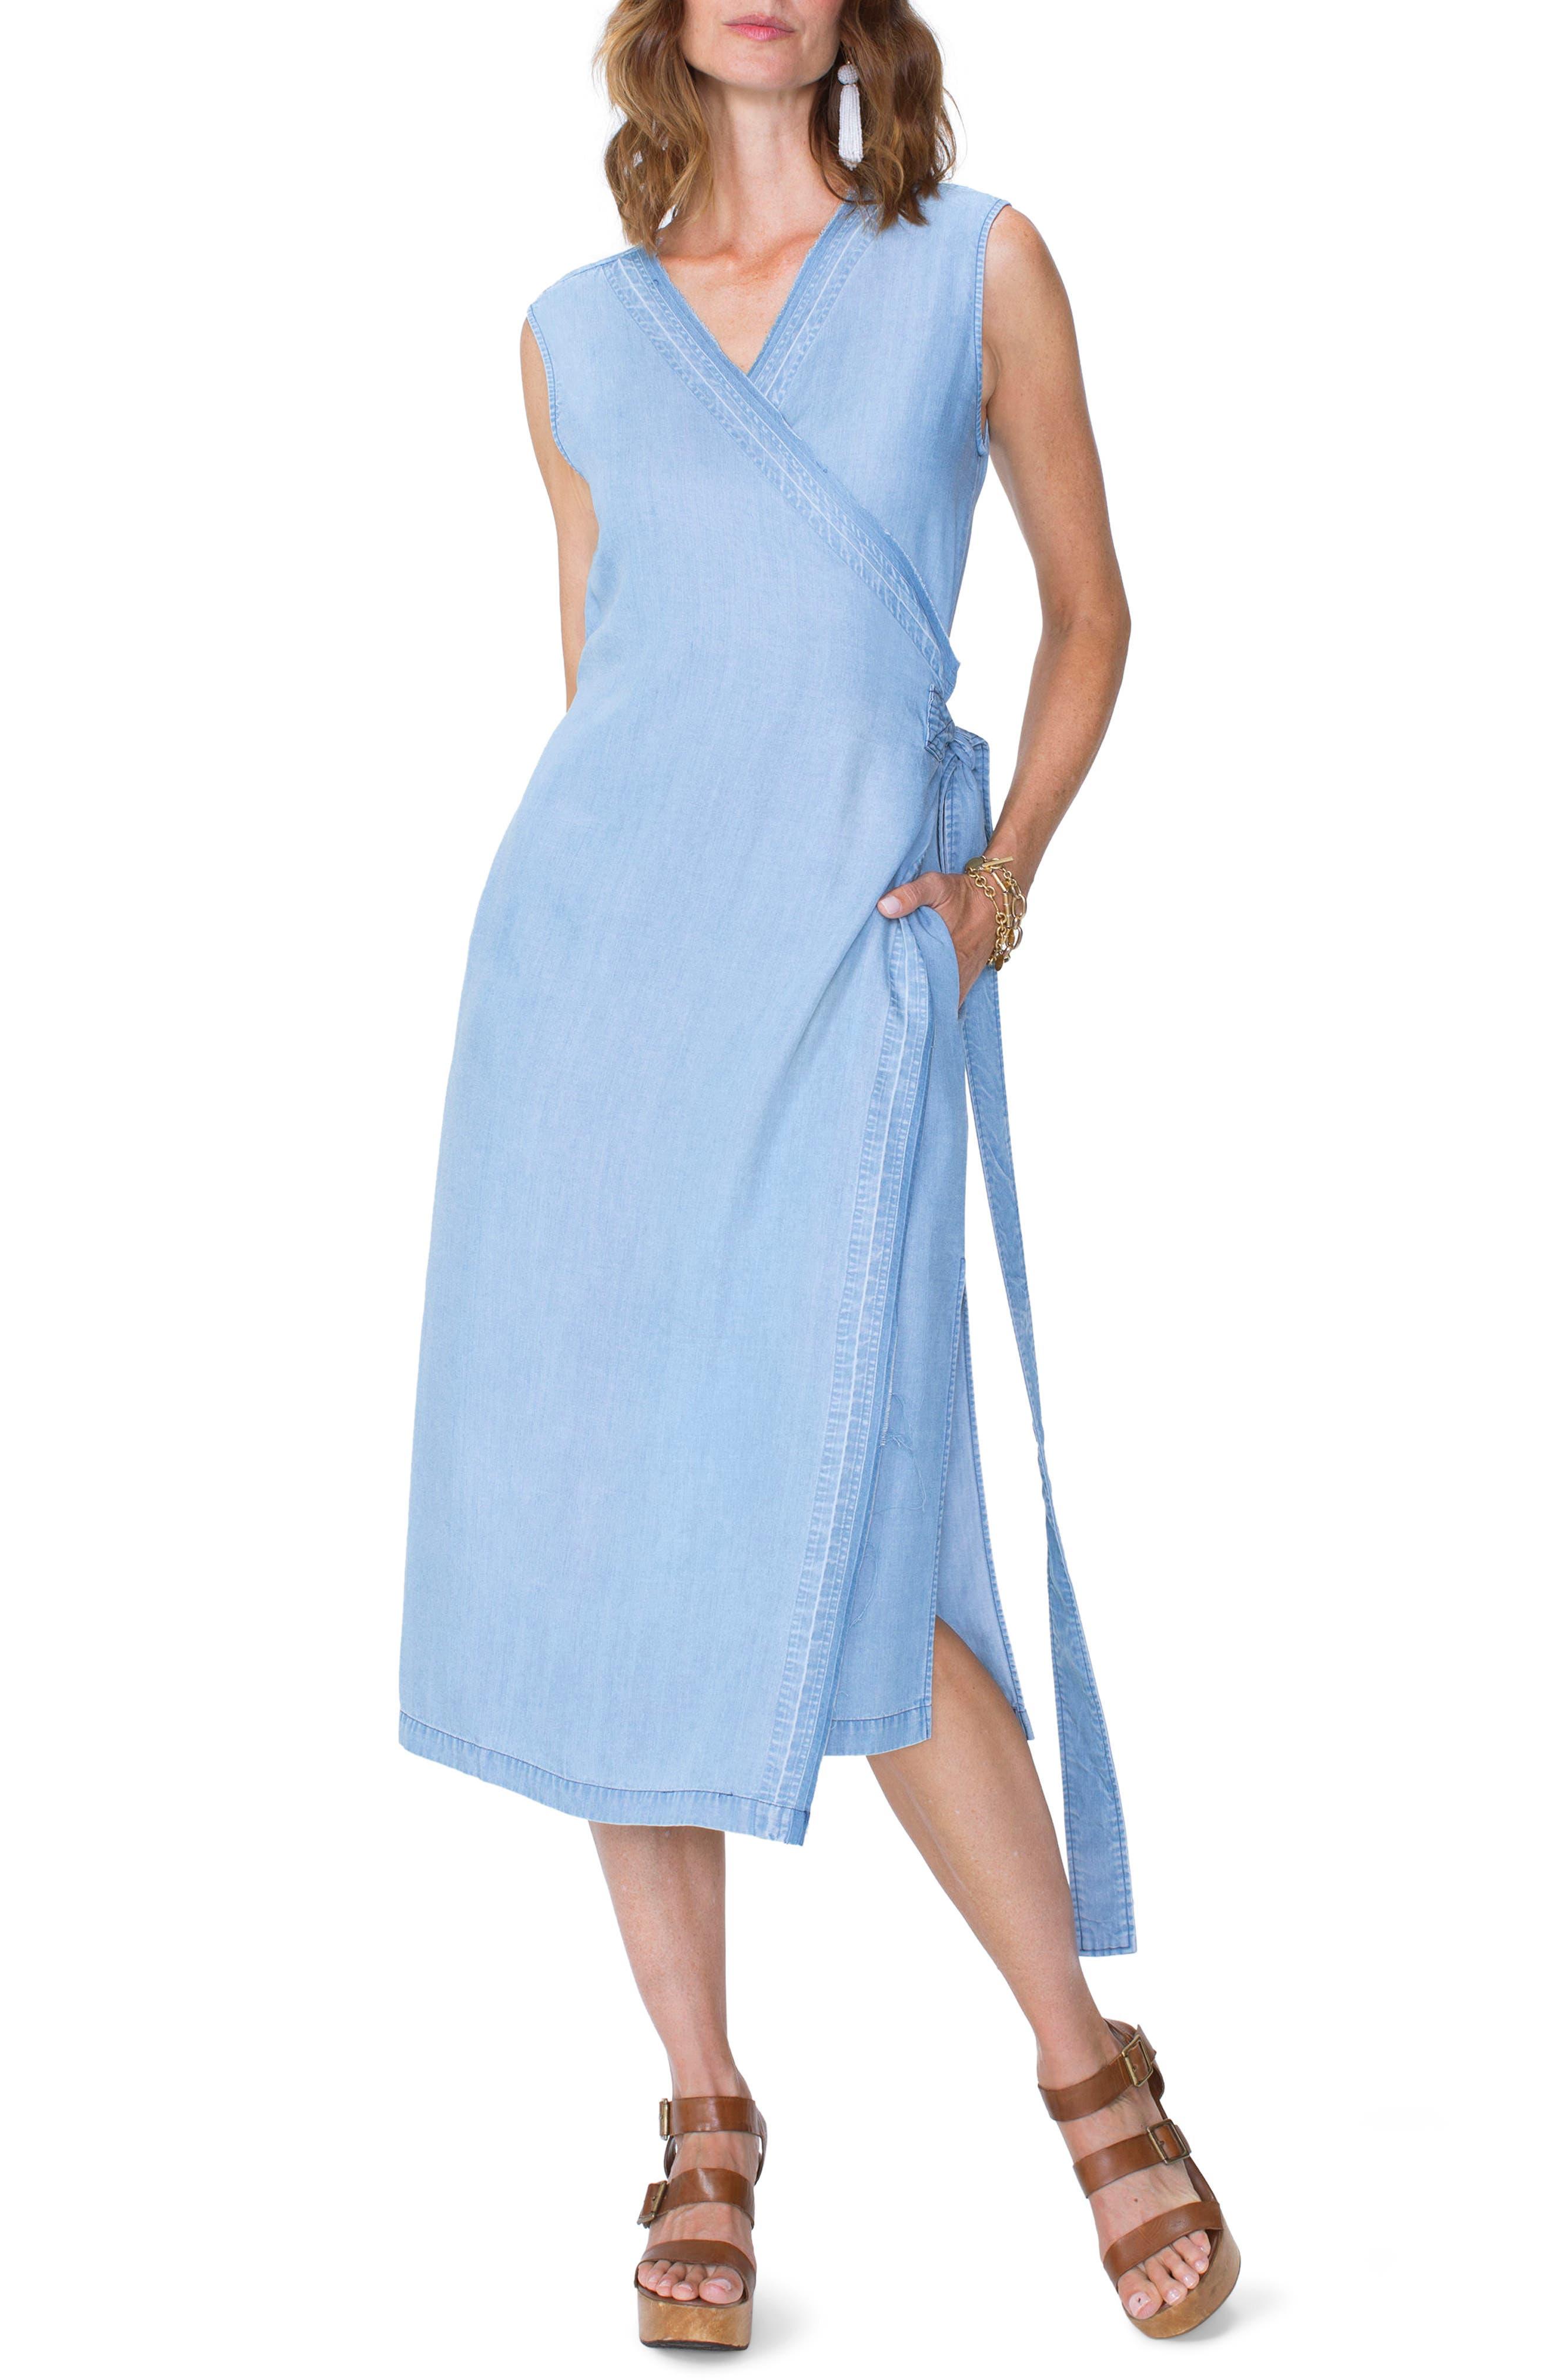 Chambray Release Detail Wrap Dress,                             Main thumbnail 1, color,                             051